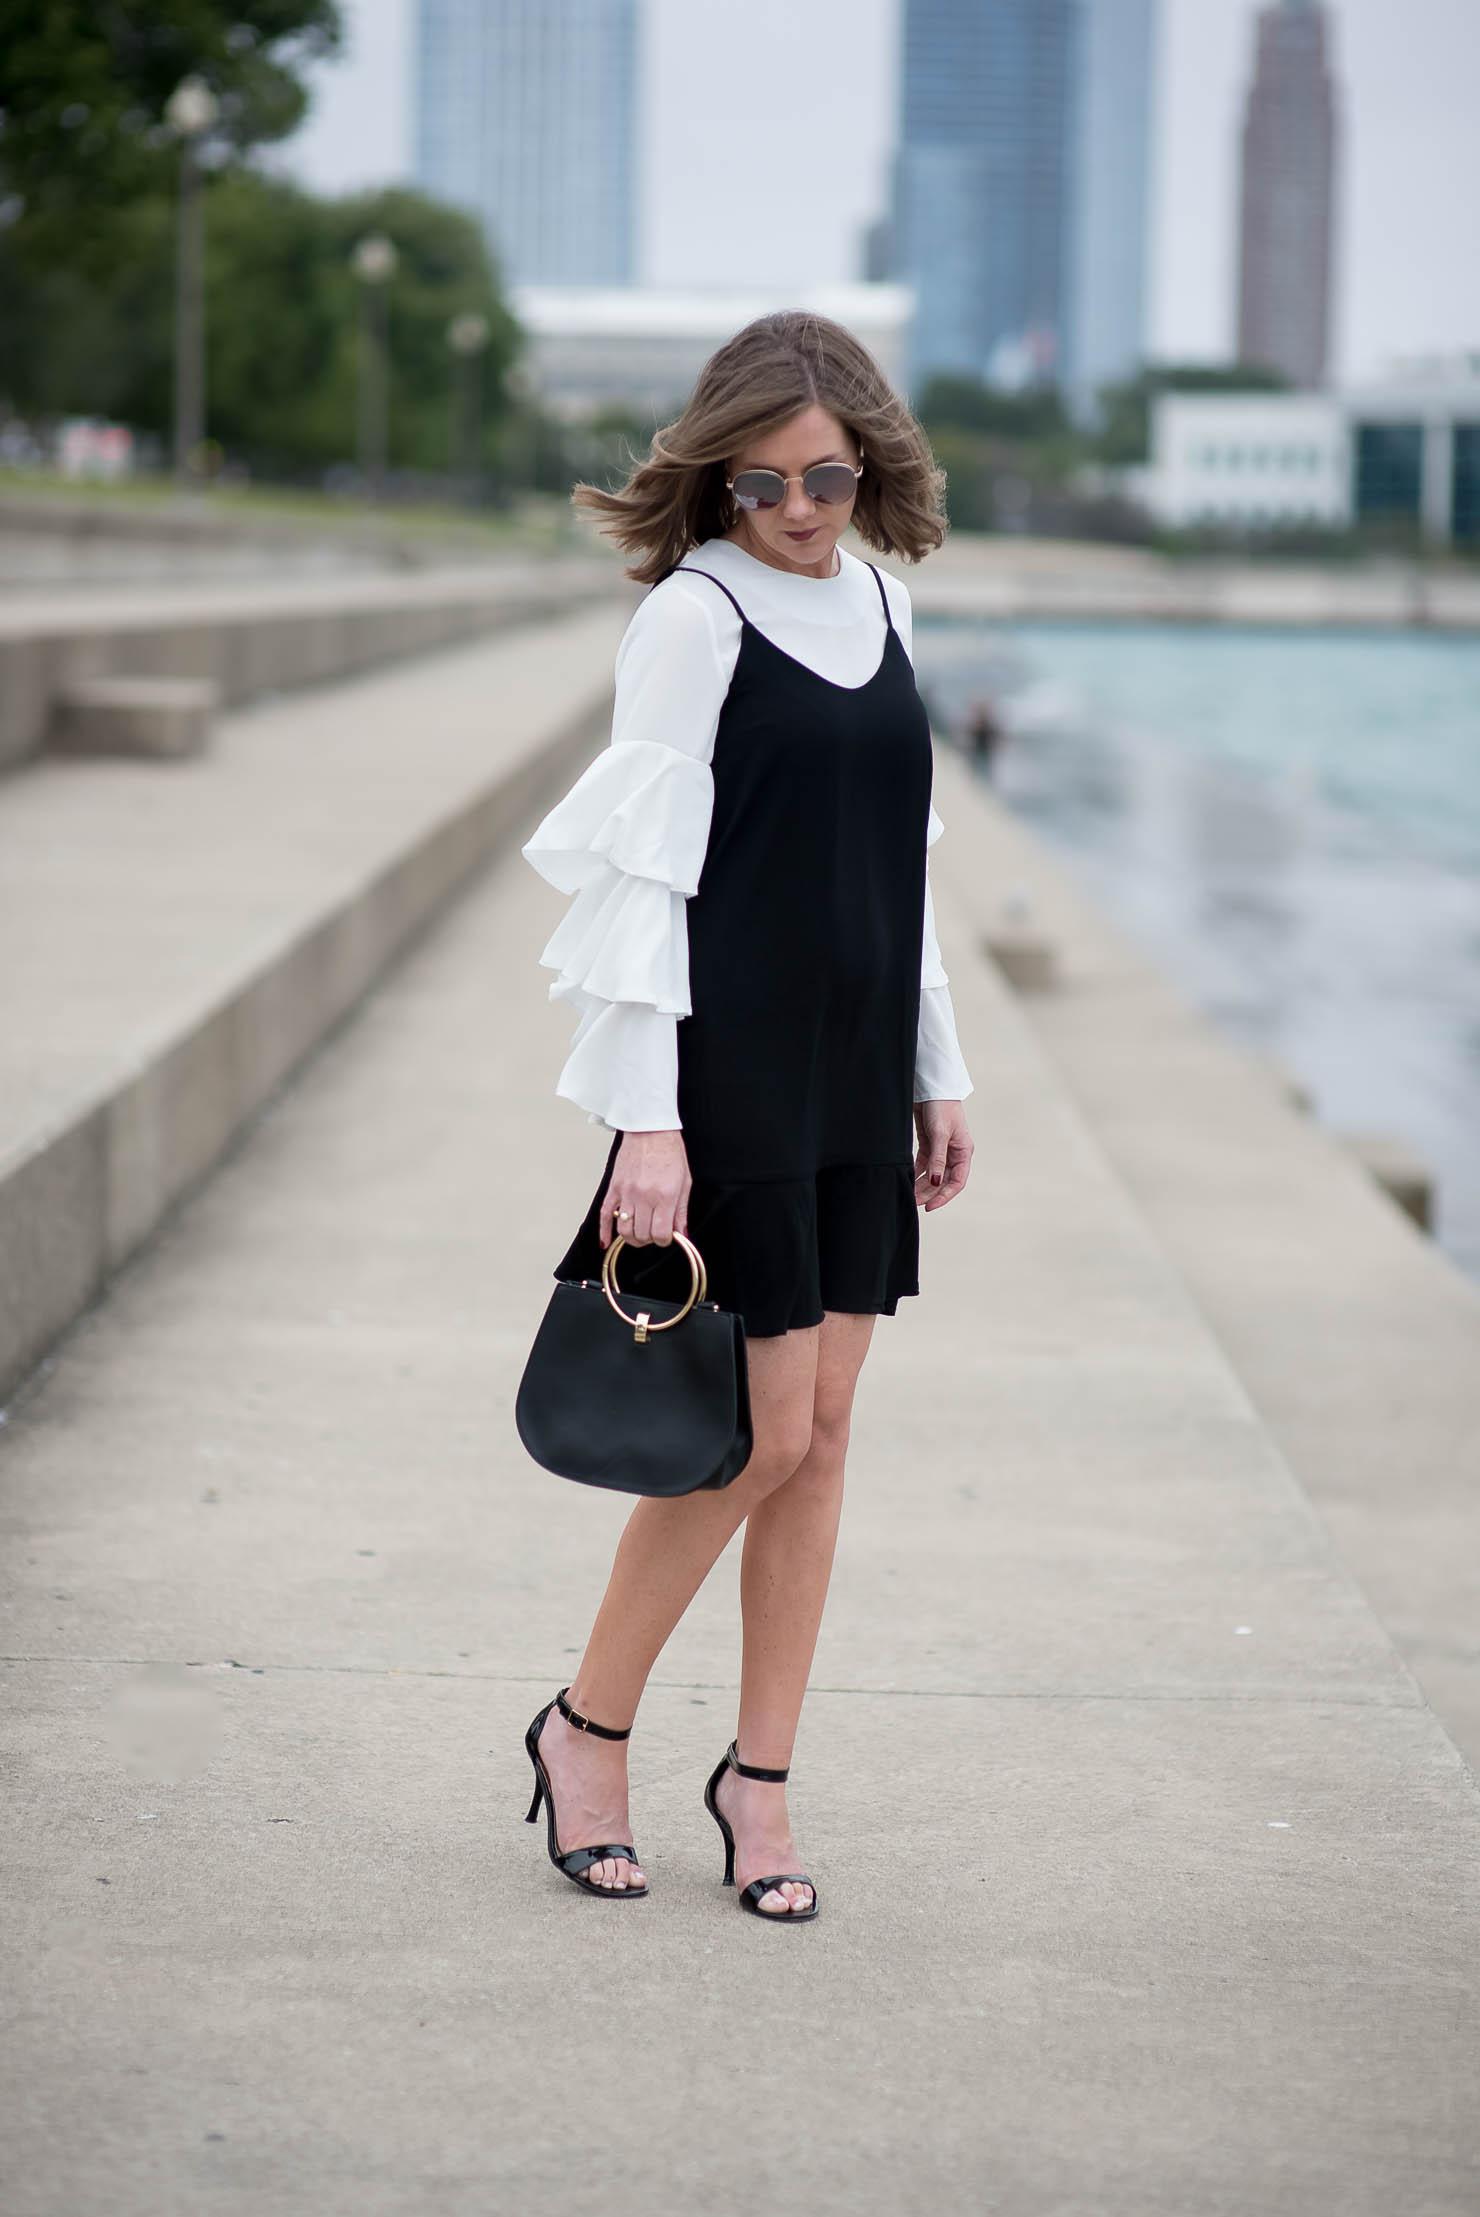 boohoo-ruffle-sleeve-blouse-asos-slip-dress-layered-ruffles-forever-21-round-handle-bag-black-and-cream